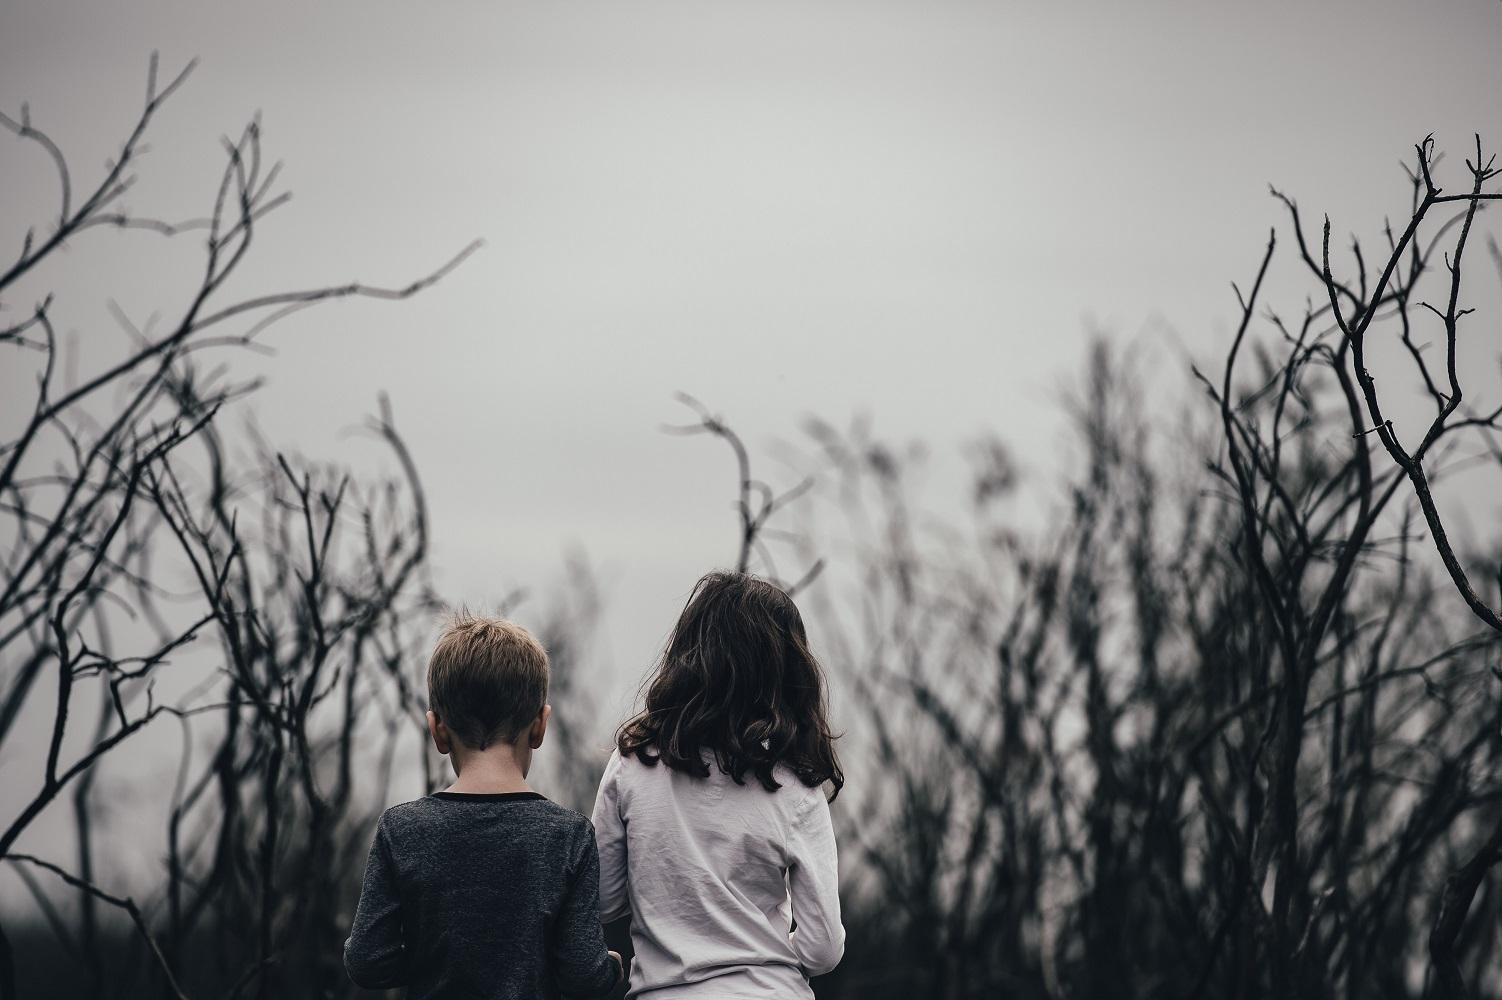 Helping children cope after bushfires